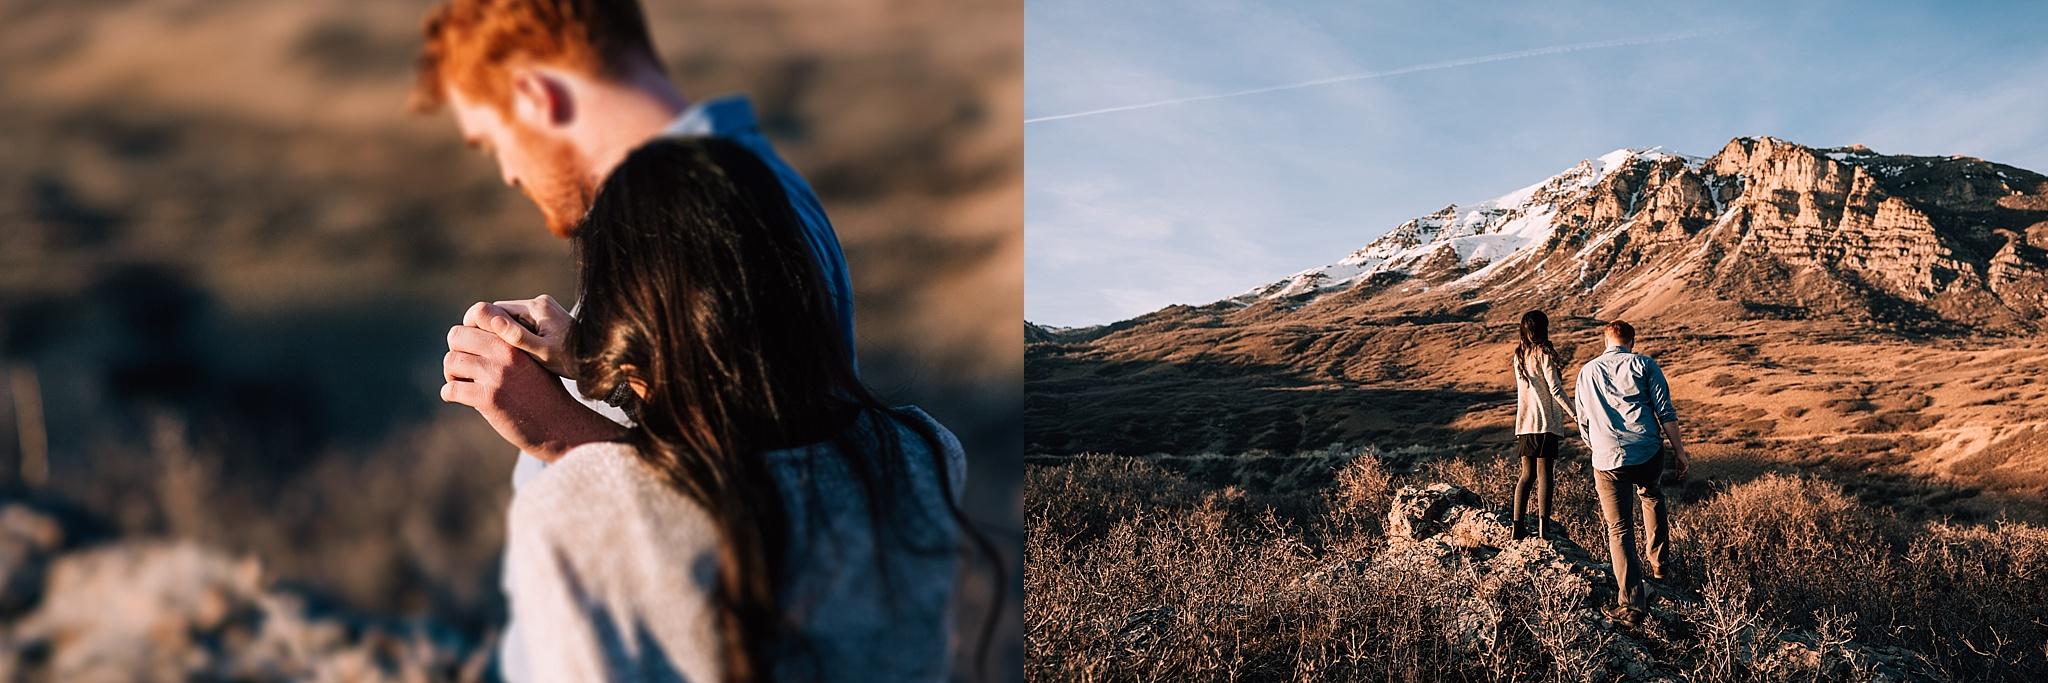 provo canyon egagement session, Adventurous bride,Bailey Dalton Photo,Intimate Wedding photographer,Traveling Photographer,Utah Engagement photographer,Utah Wedding Photographer,boho bride,